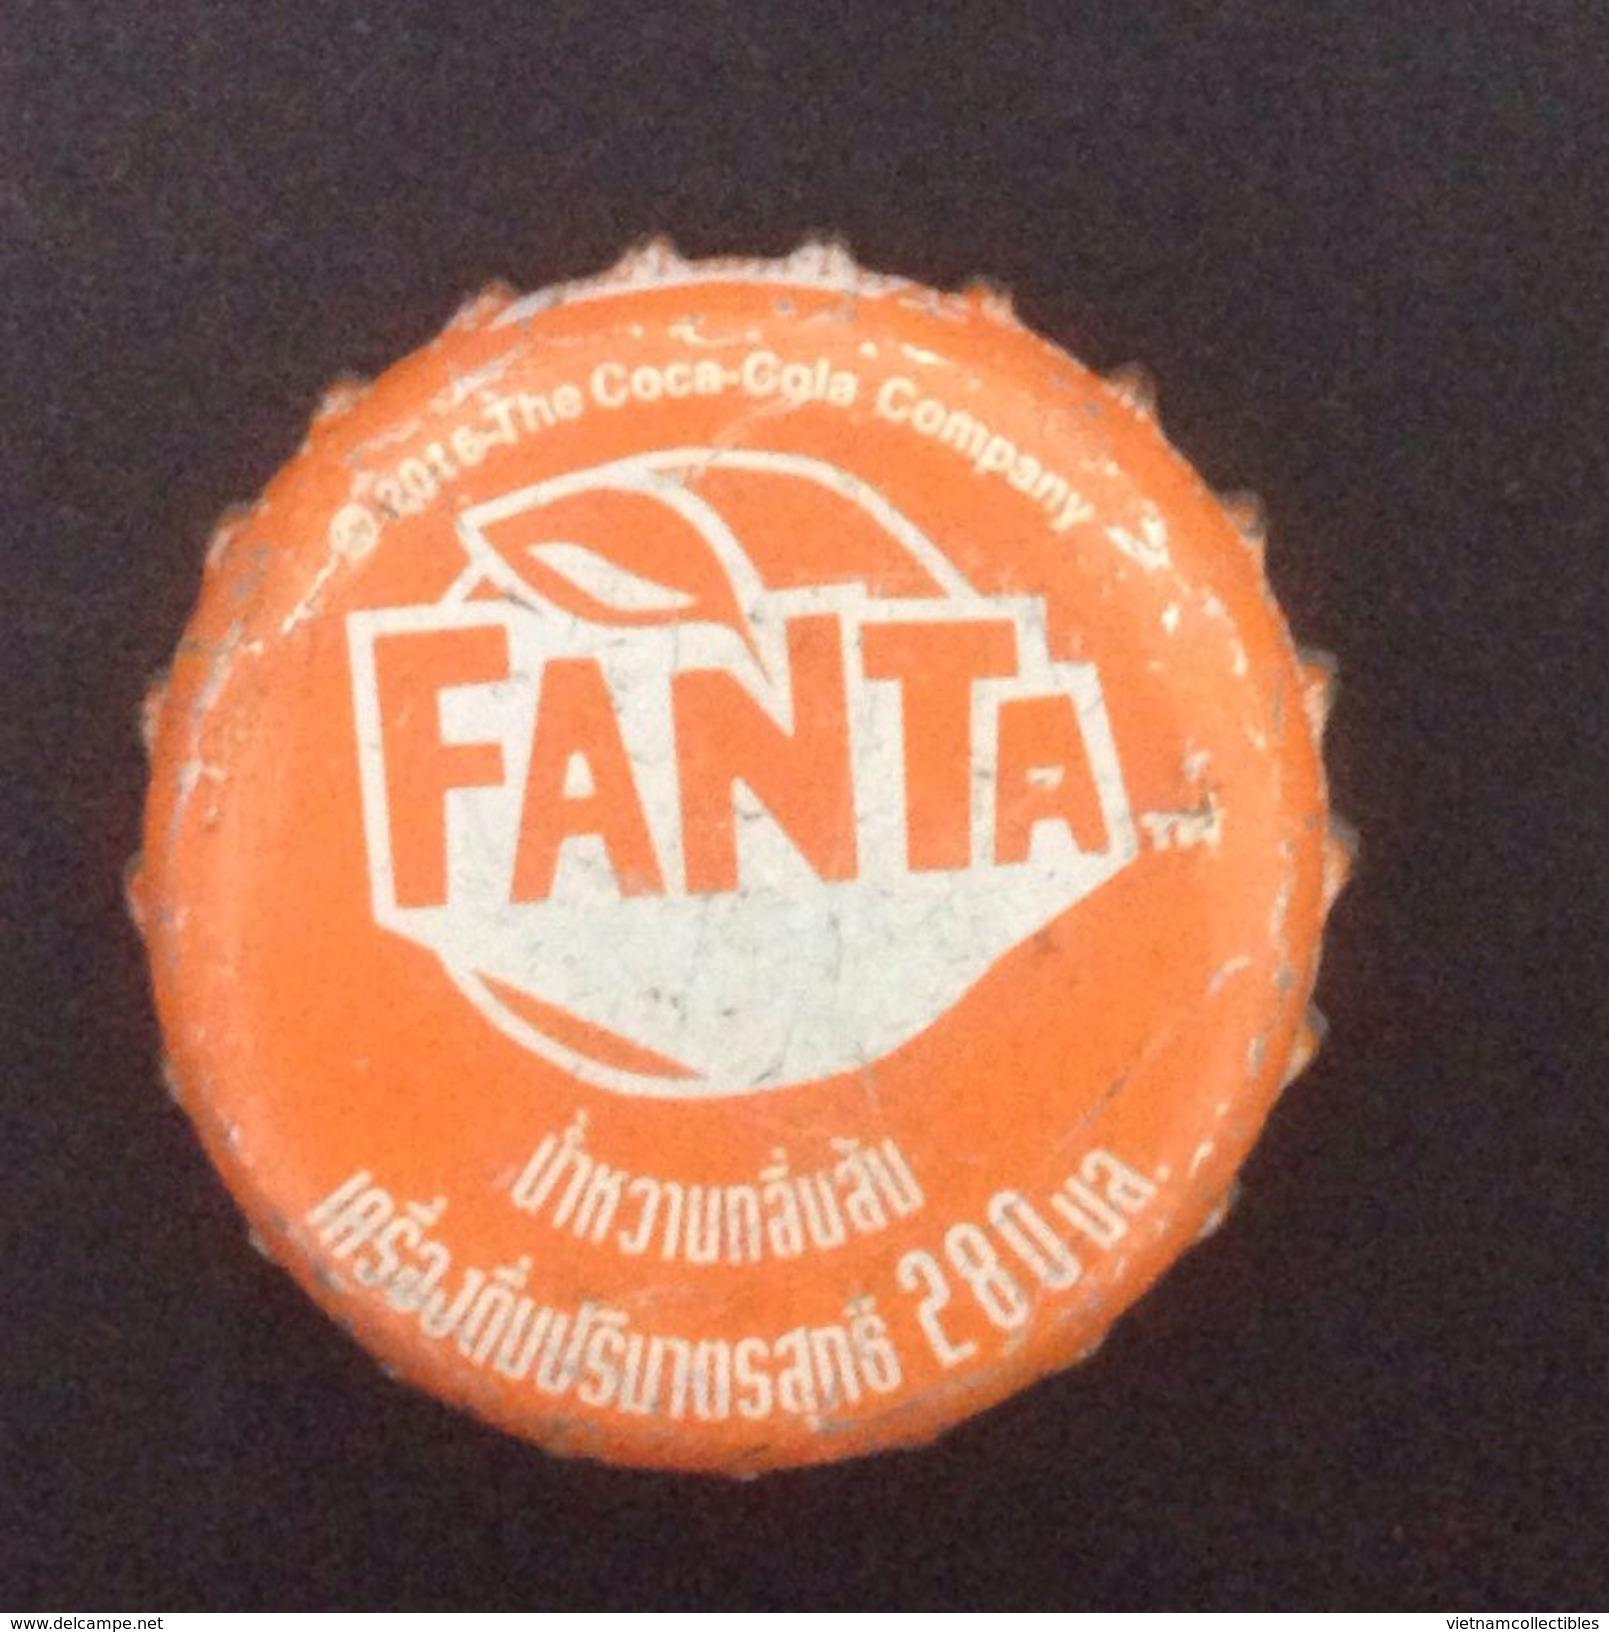 Thailand Coca Cola FANTA Used Bottle Crown Cap / Kronkorken / Capsule / Chapa / Tappi - Casquettes